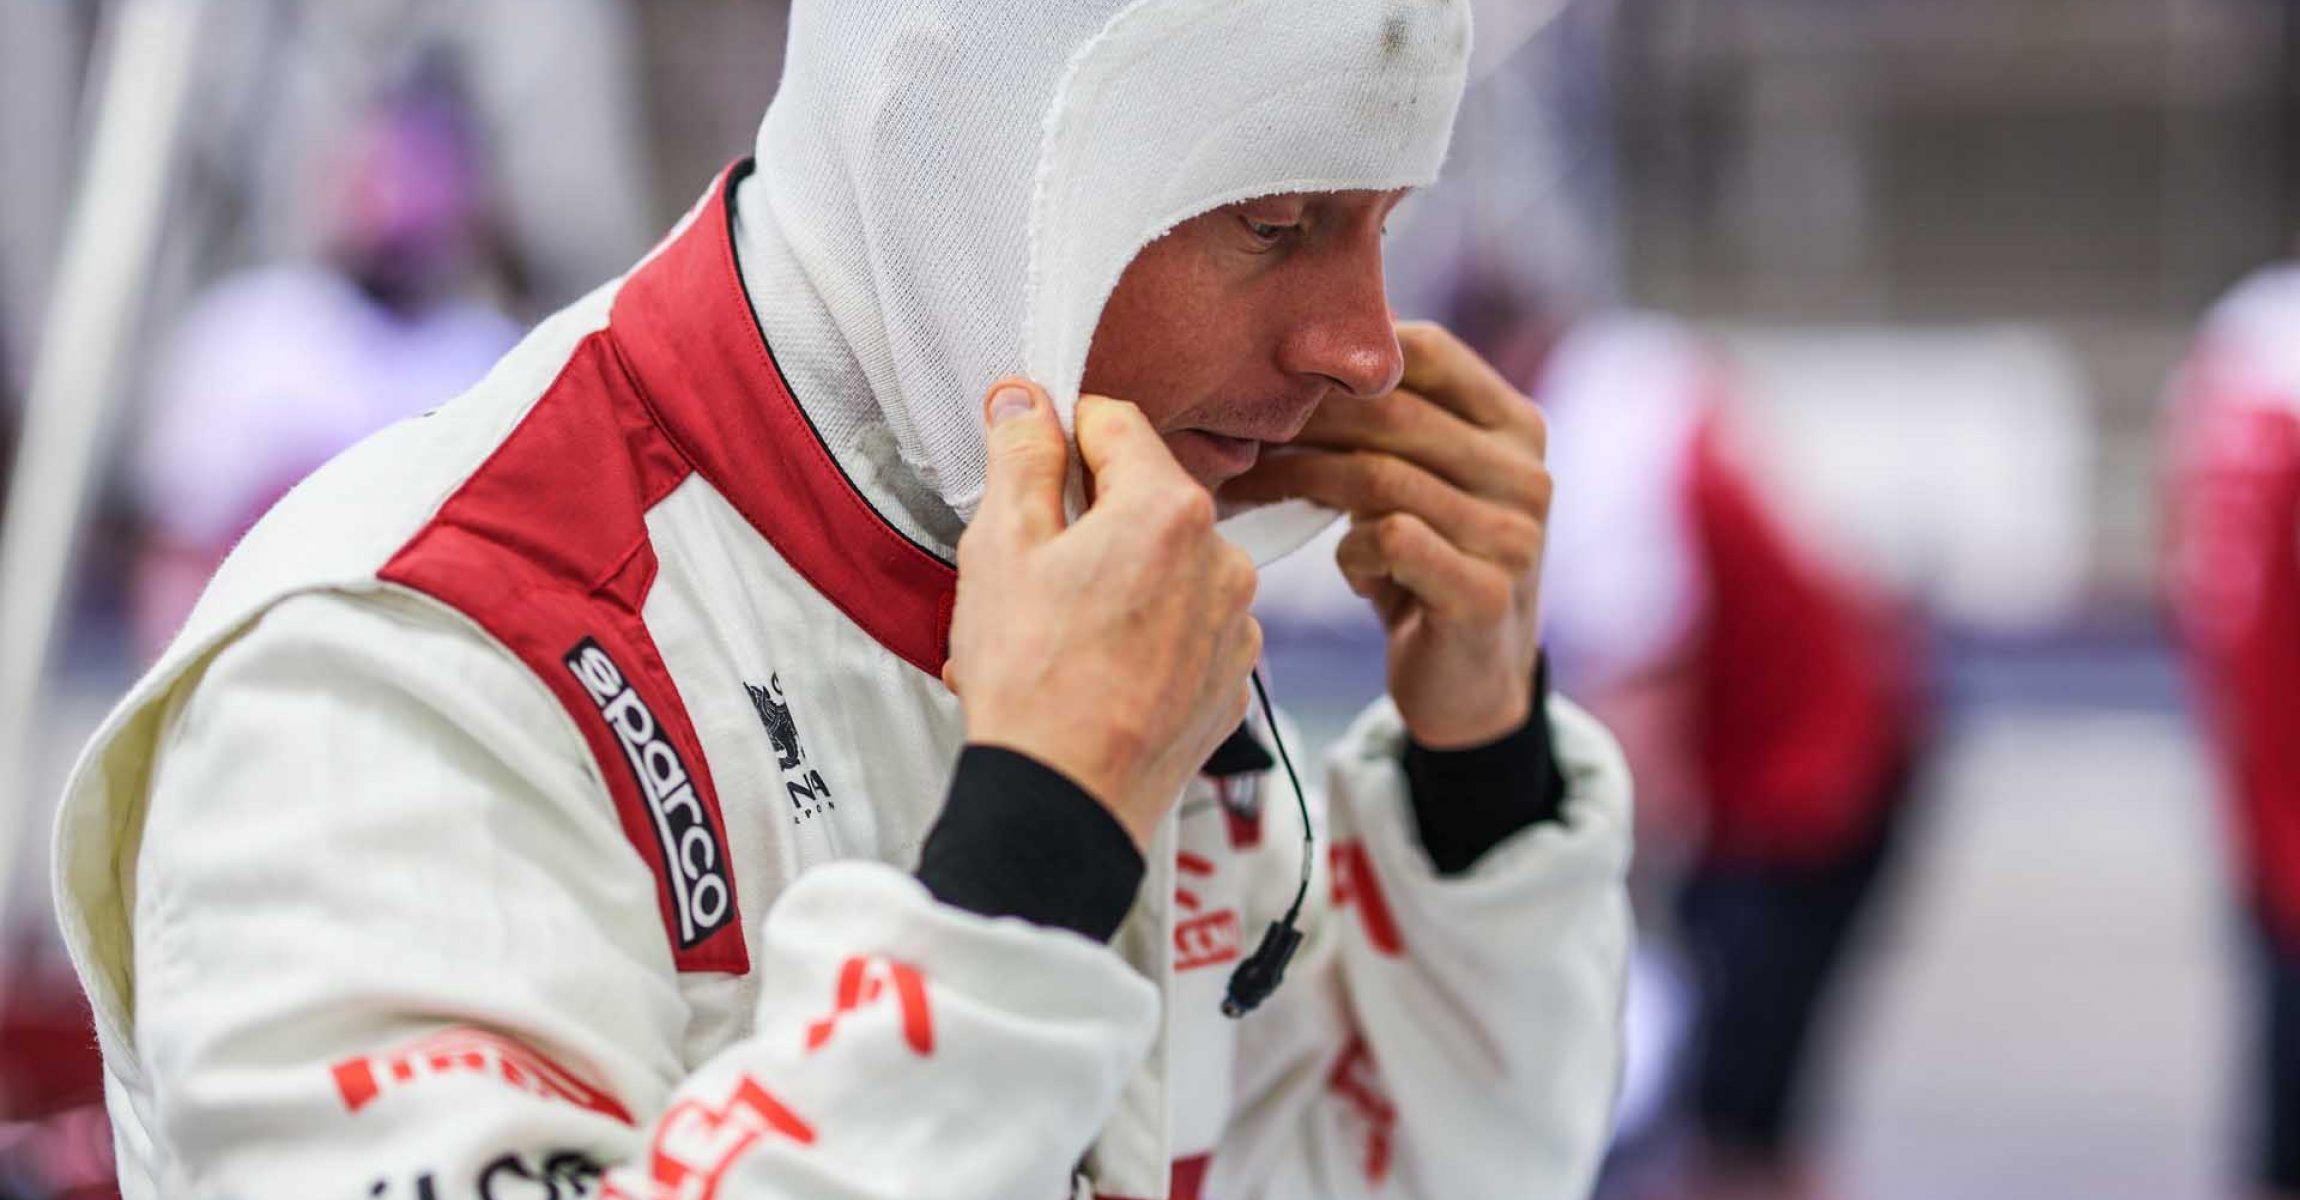 RAIKKONEN Kimi Räikkönen (fin), Alfa Romeo Racing ORLEN C39, portrait during the Formula 1 Gulf Air Bahrain Grand Prix 2020, from November 27 to 29, 2020 on the Bahrain International Circuit, in Sakhir, Bahrain - Photo Antonin Vincent / DPPI